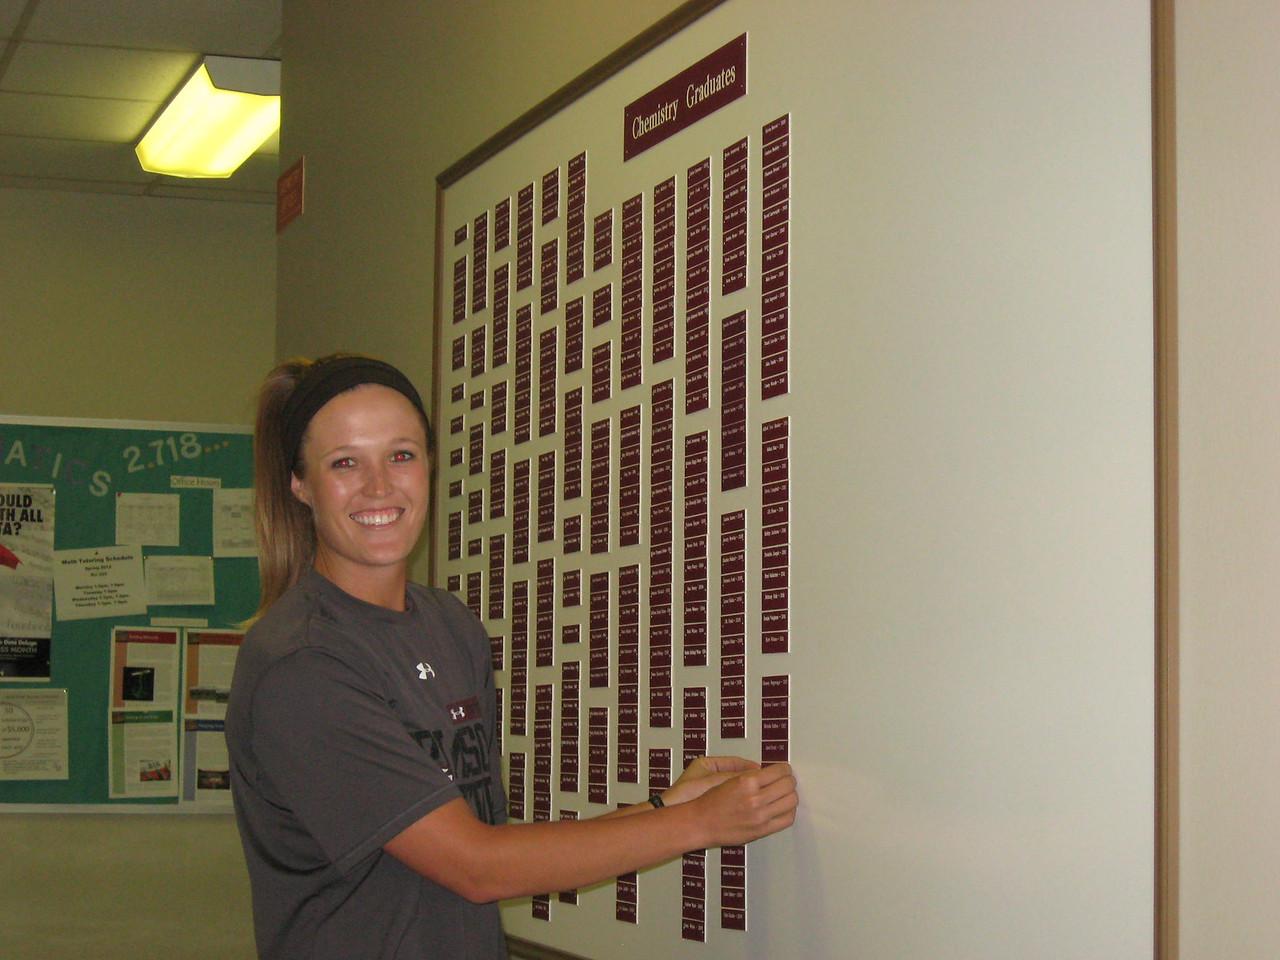 Aubrey Jones putting her nameplate on the Chemistry Graduates board.